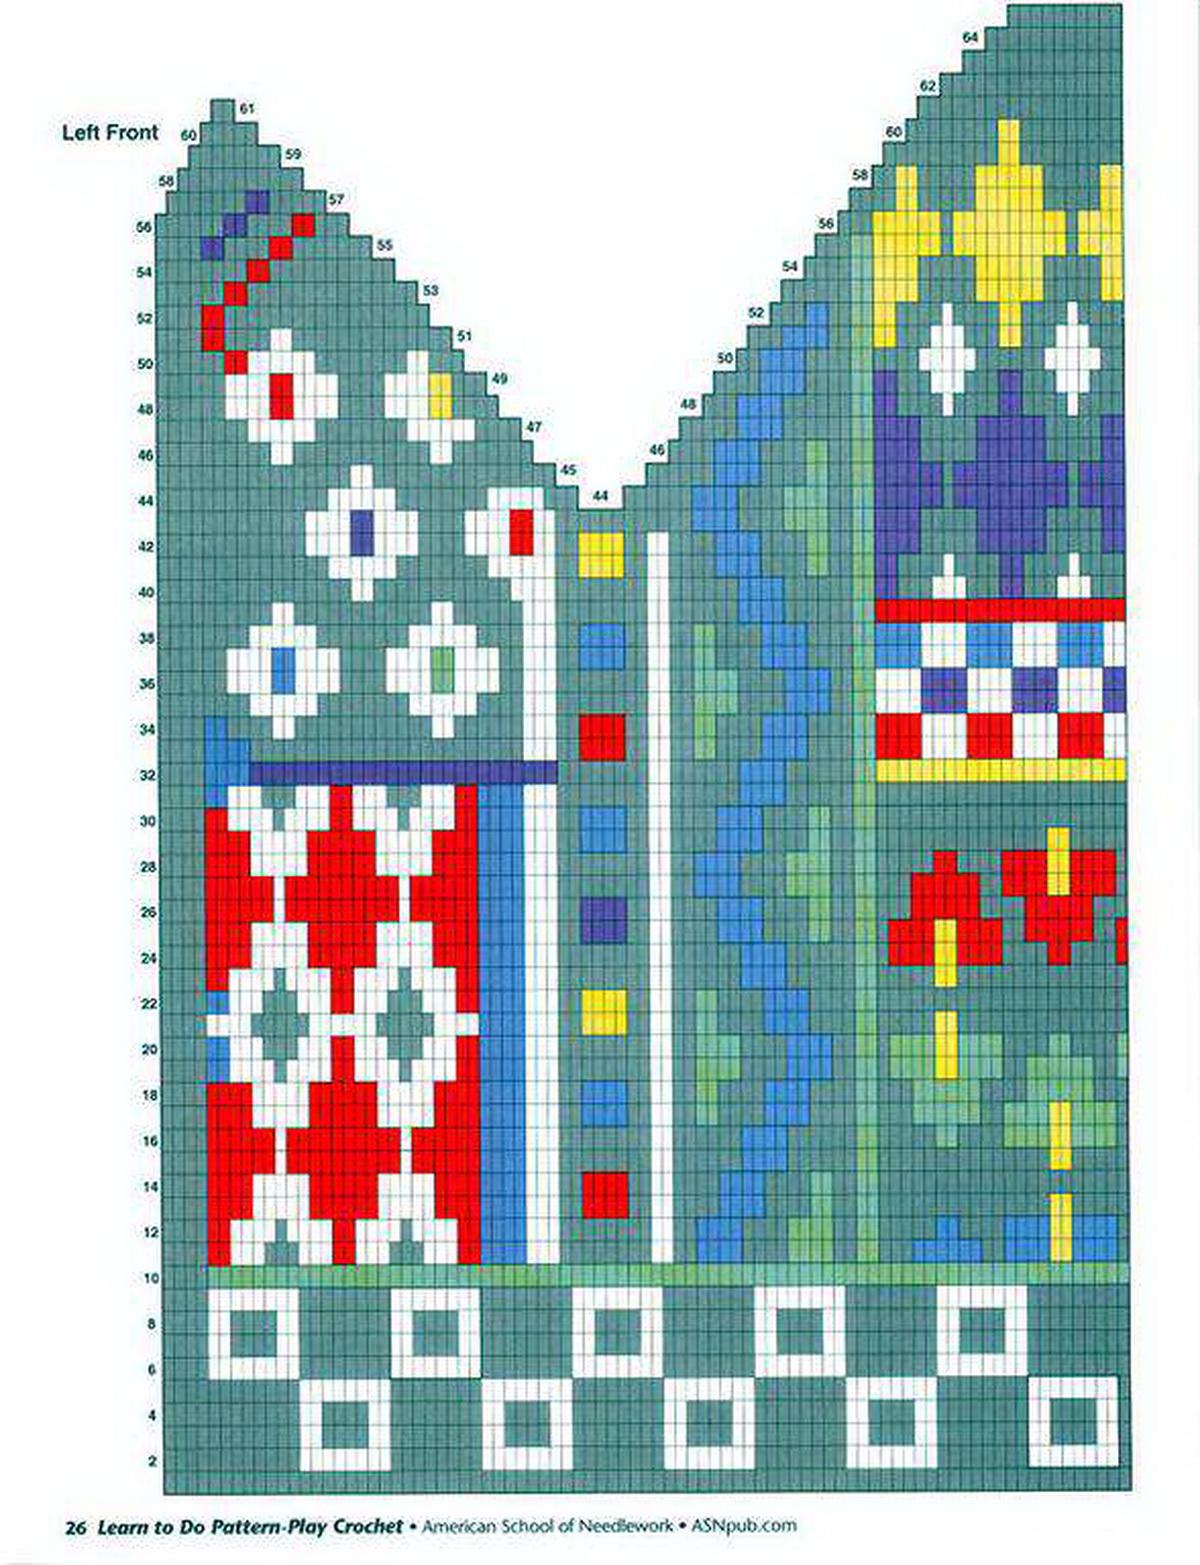 0245_Learn to do pattern-play crochet (4)